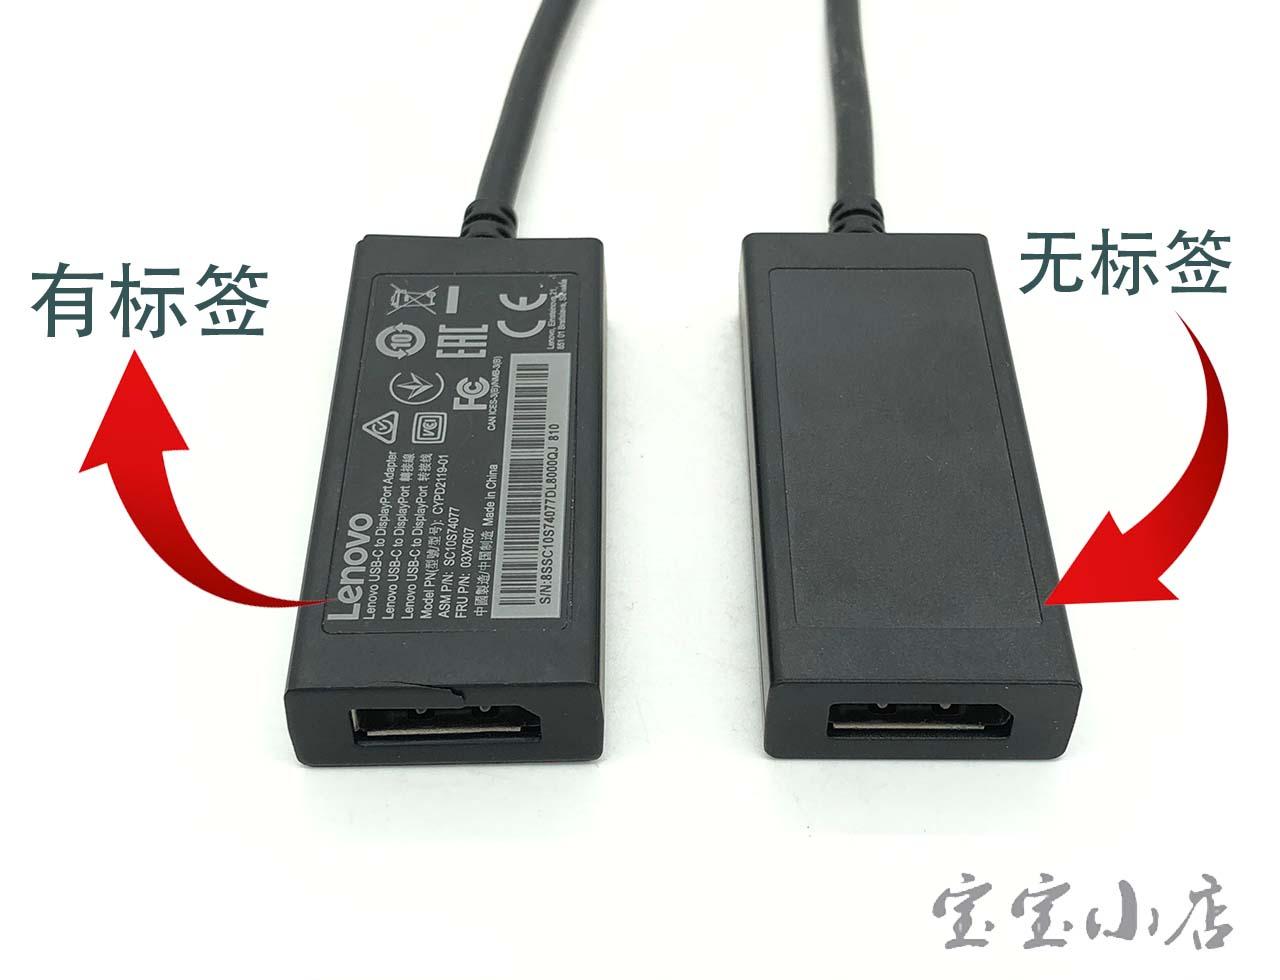 Lenovo USB-C to DisplayPort Adapter 联想Type c to DP转换线 转换头03X7607 4K 3840*2160 4K 60Hz CYPD2119-01 03X7204